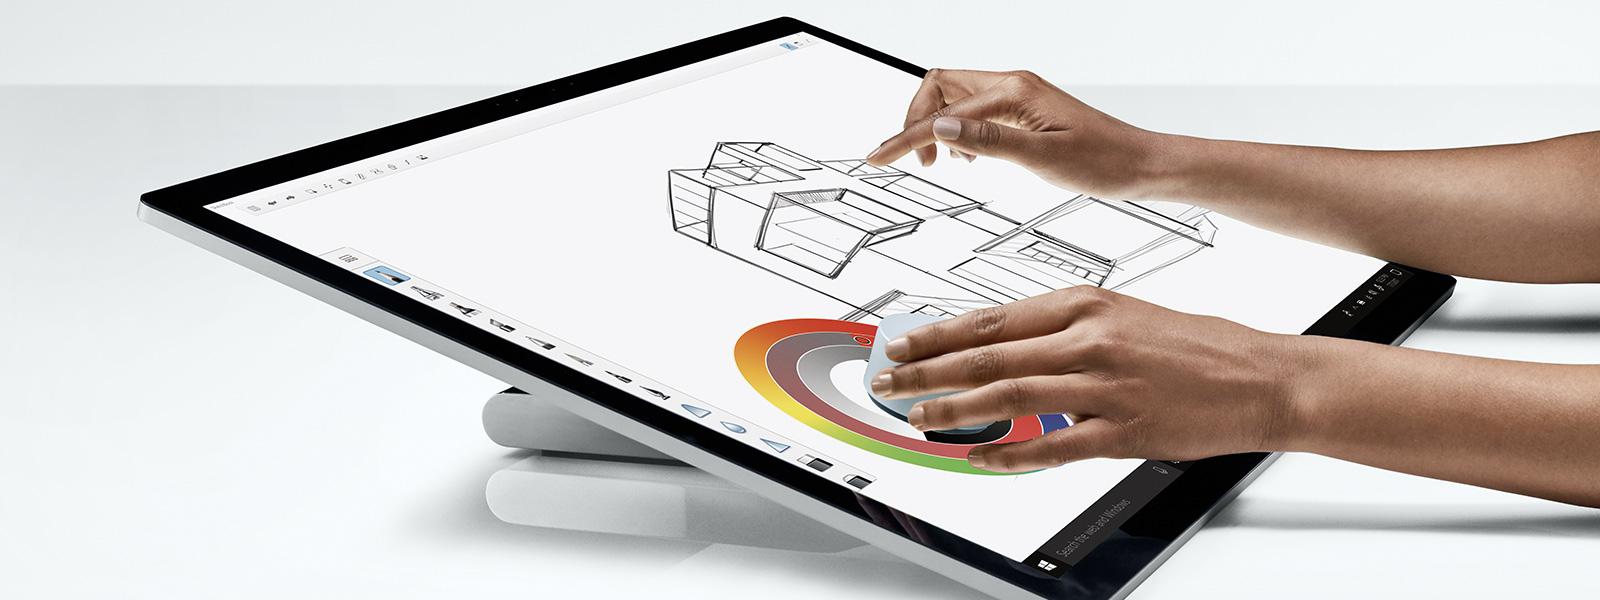 某人使用 Surface Dial 与 Surface Studio 交互